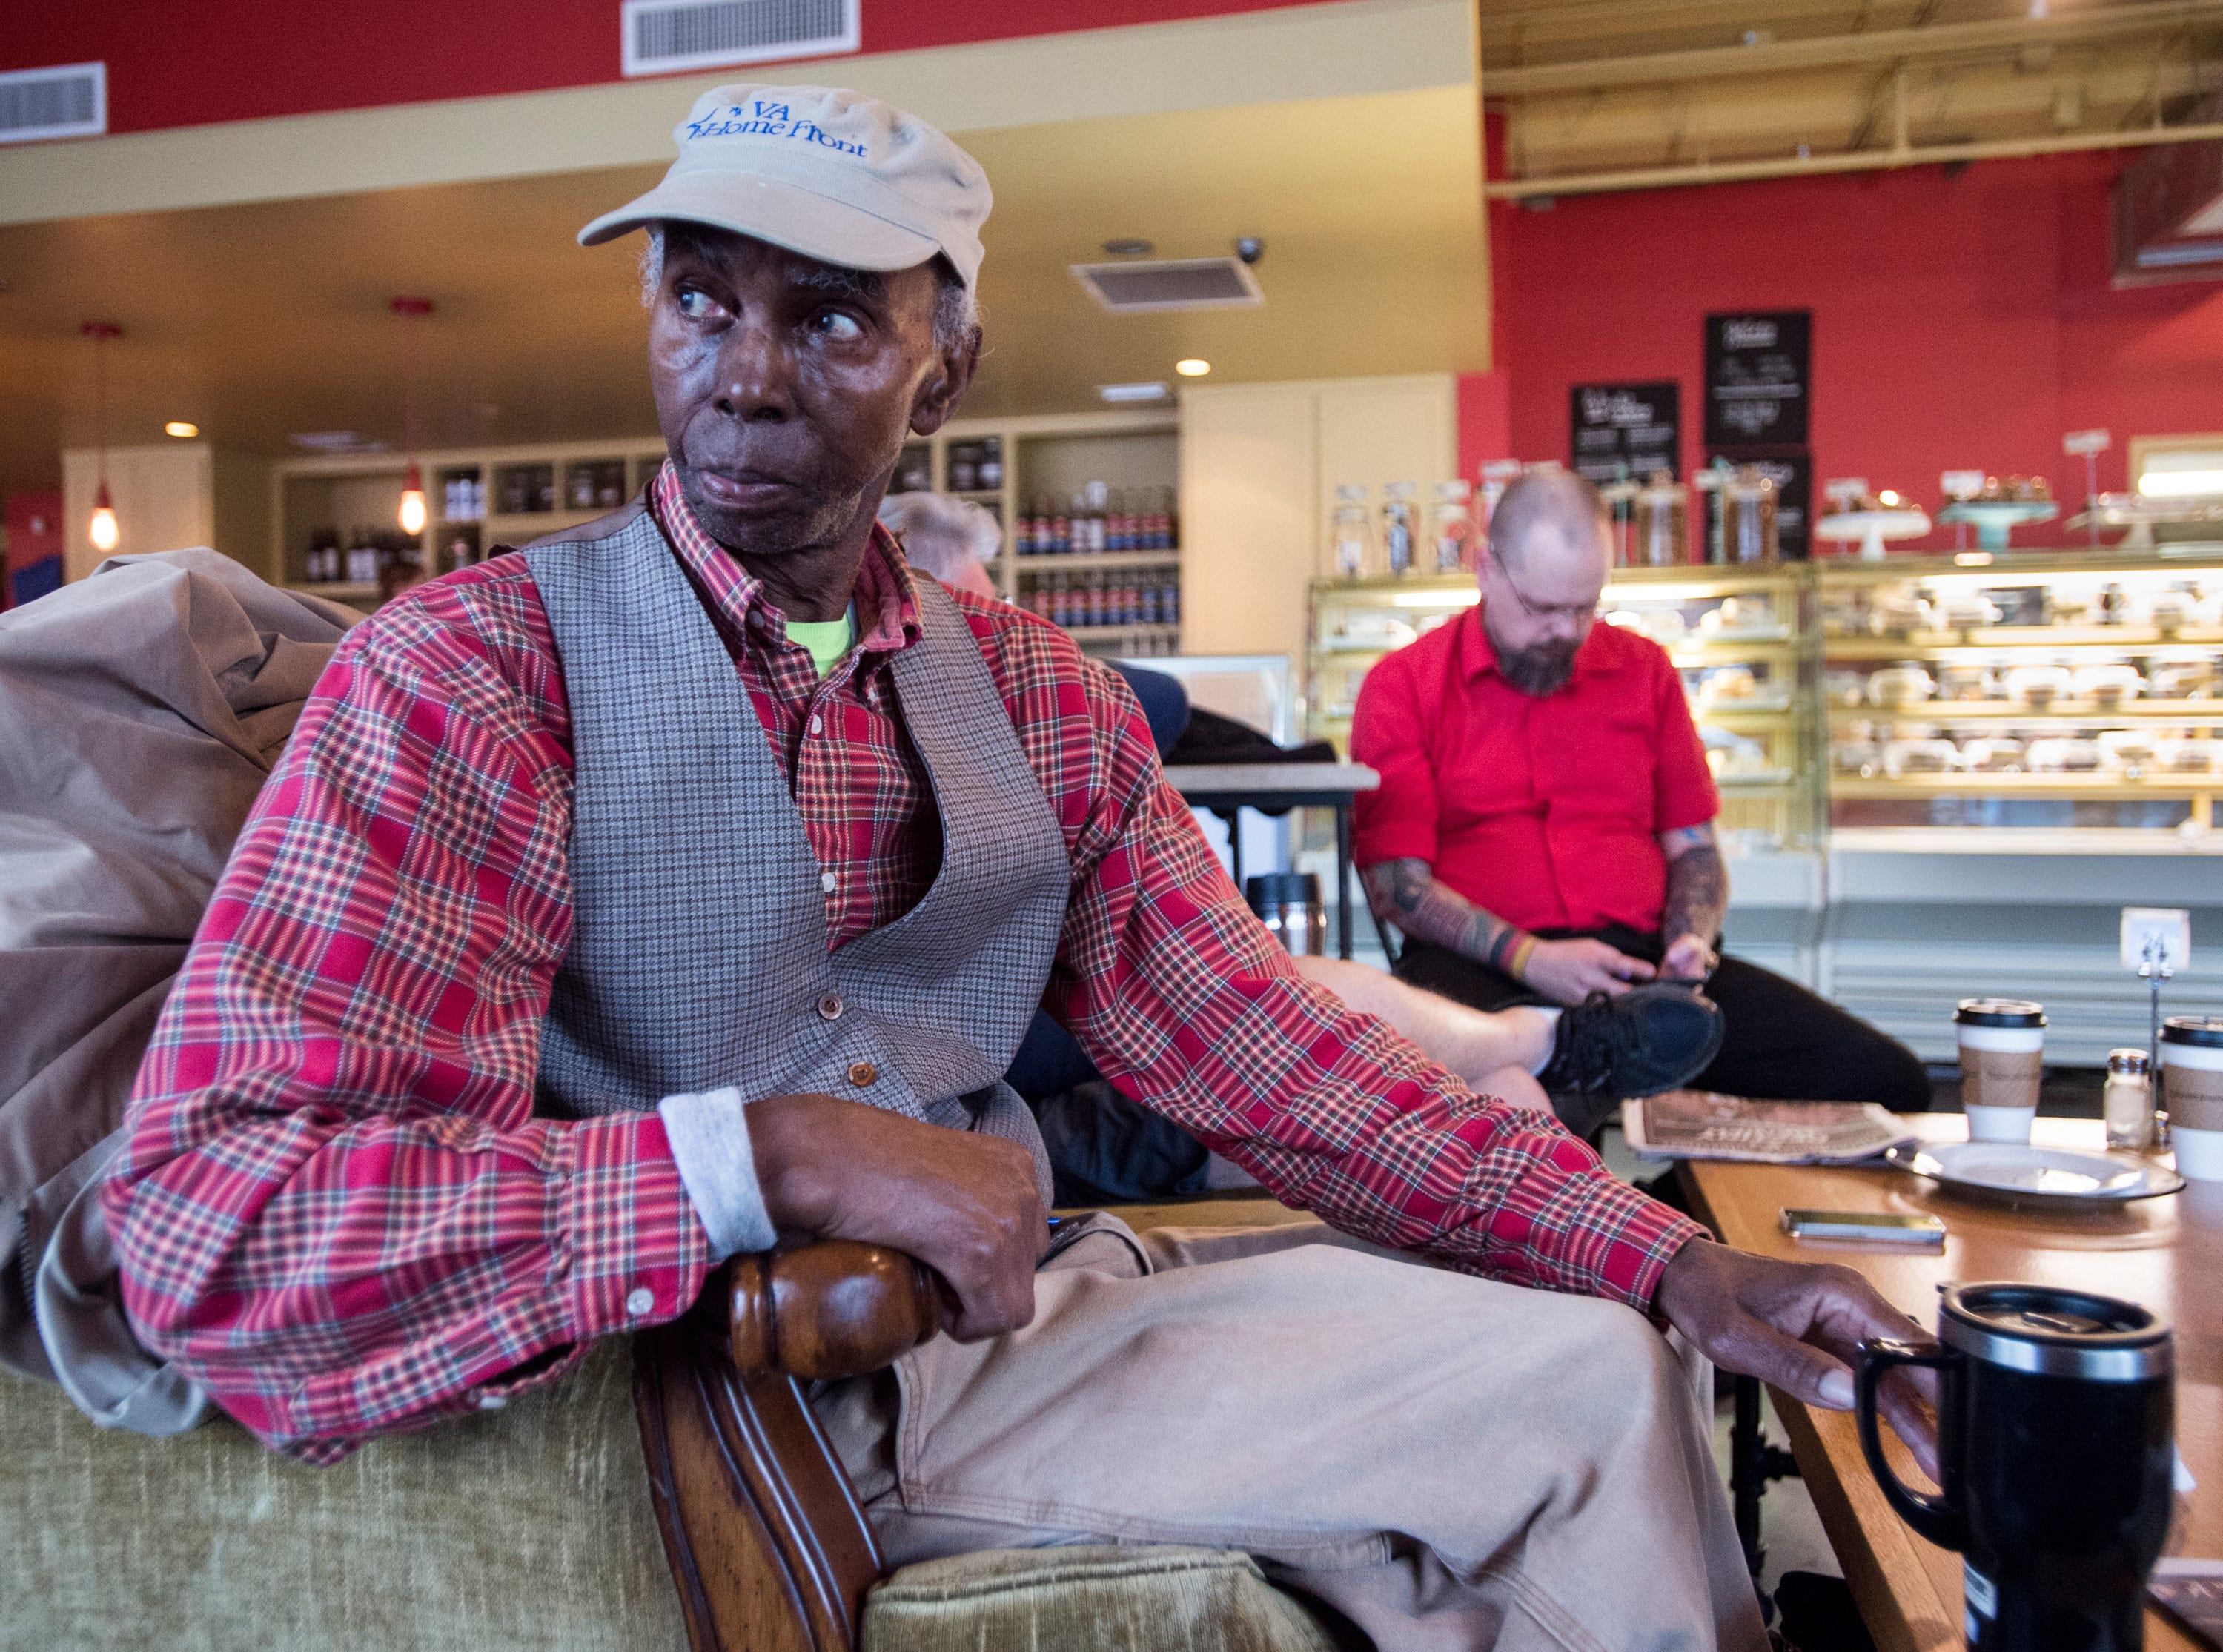 Selma Williams enjoys his coffee at Cafe Louisa in Montgomery, Ala., on Tuesday, Jan. 8, 2019.